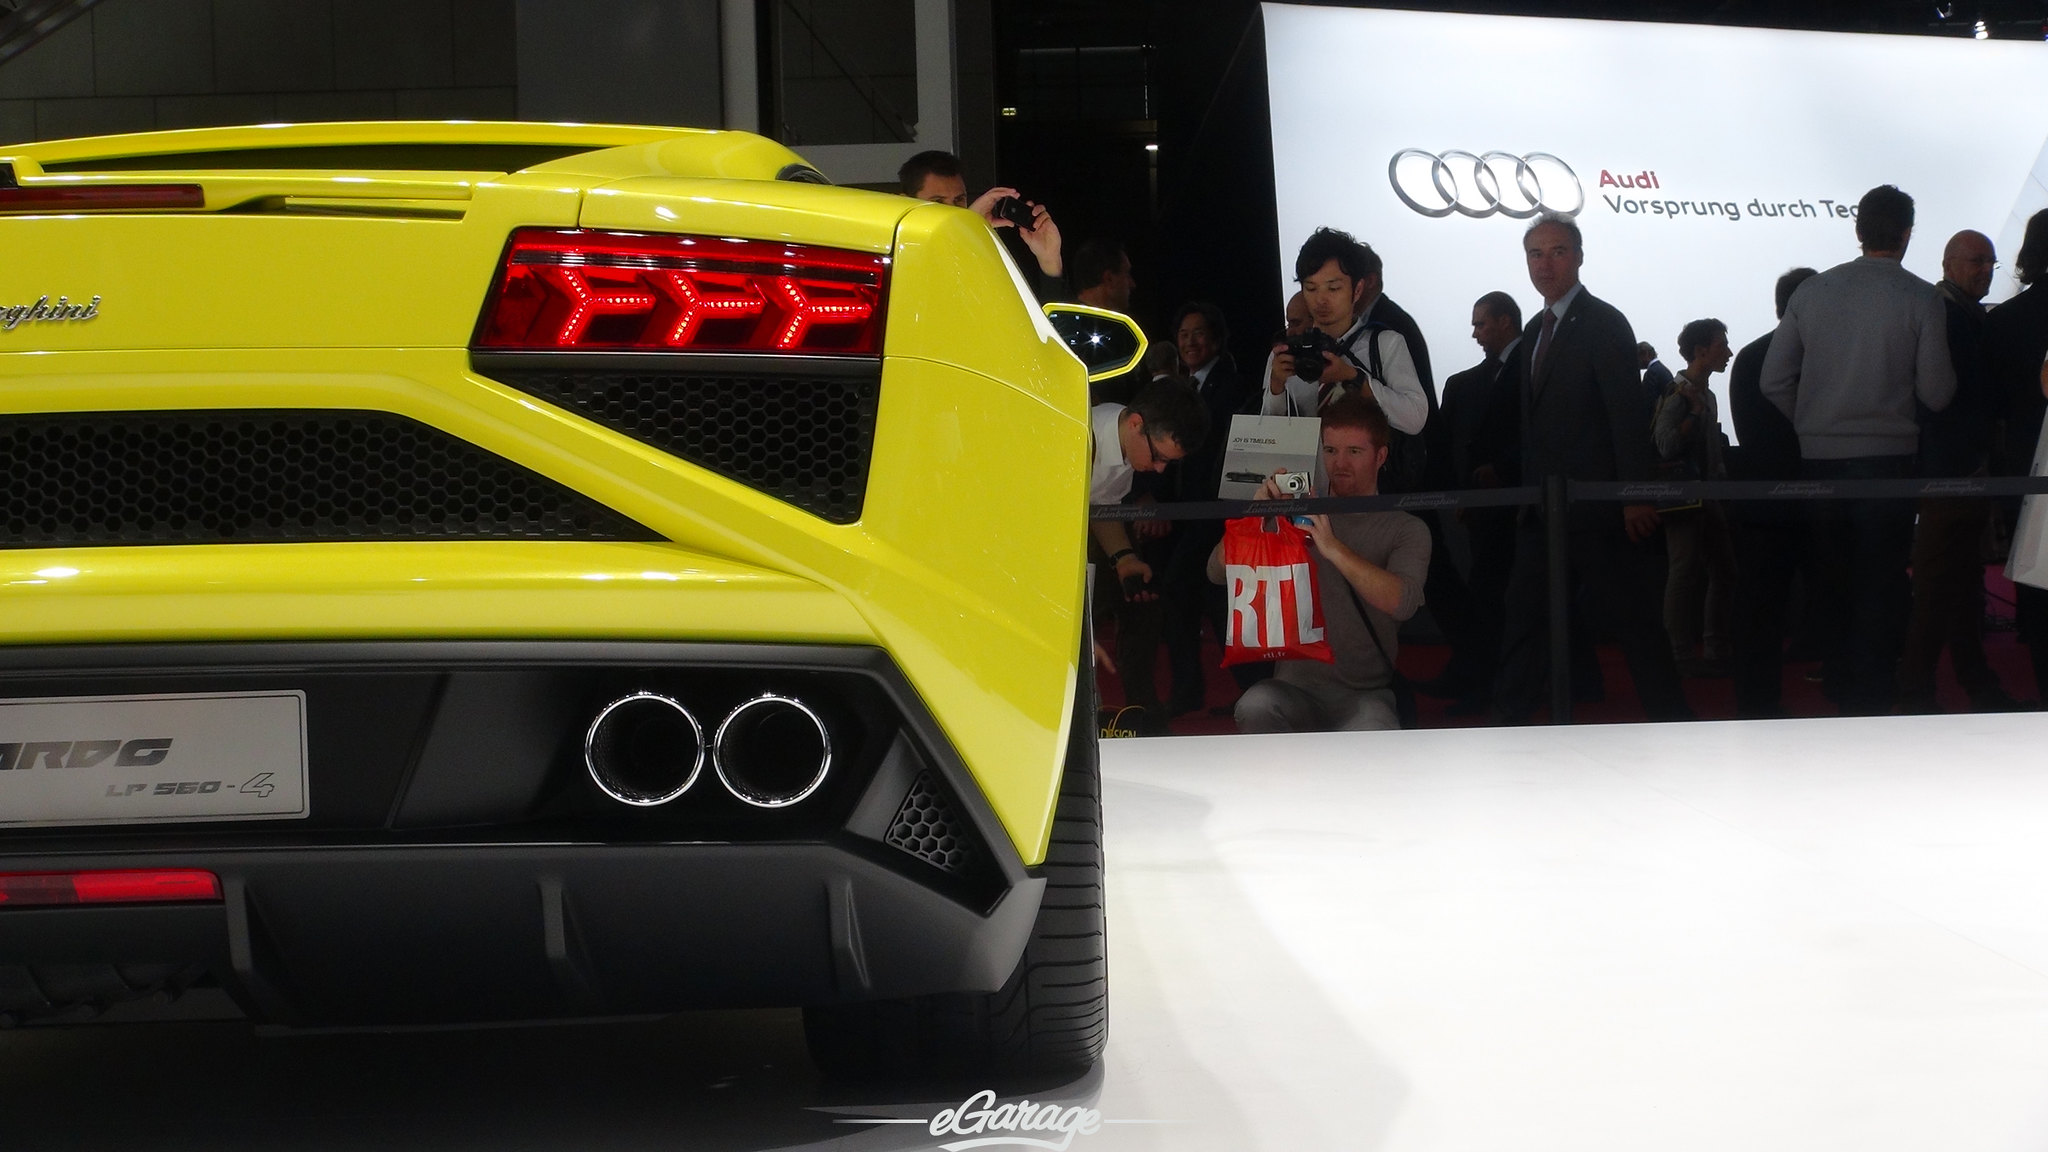 8034741879 76f362ded5 k 2012 Paris Motor Show